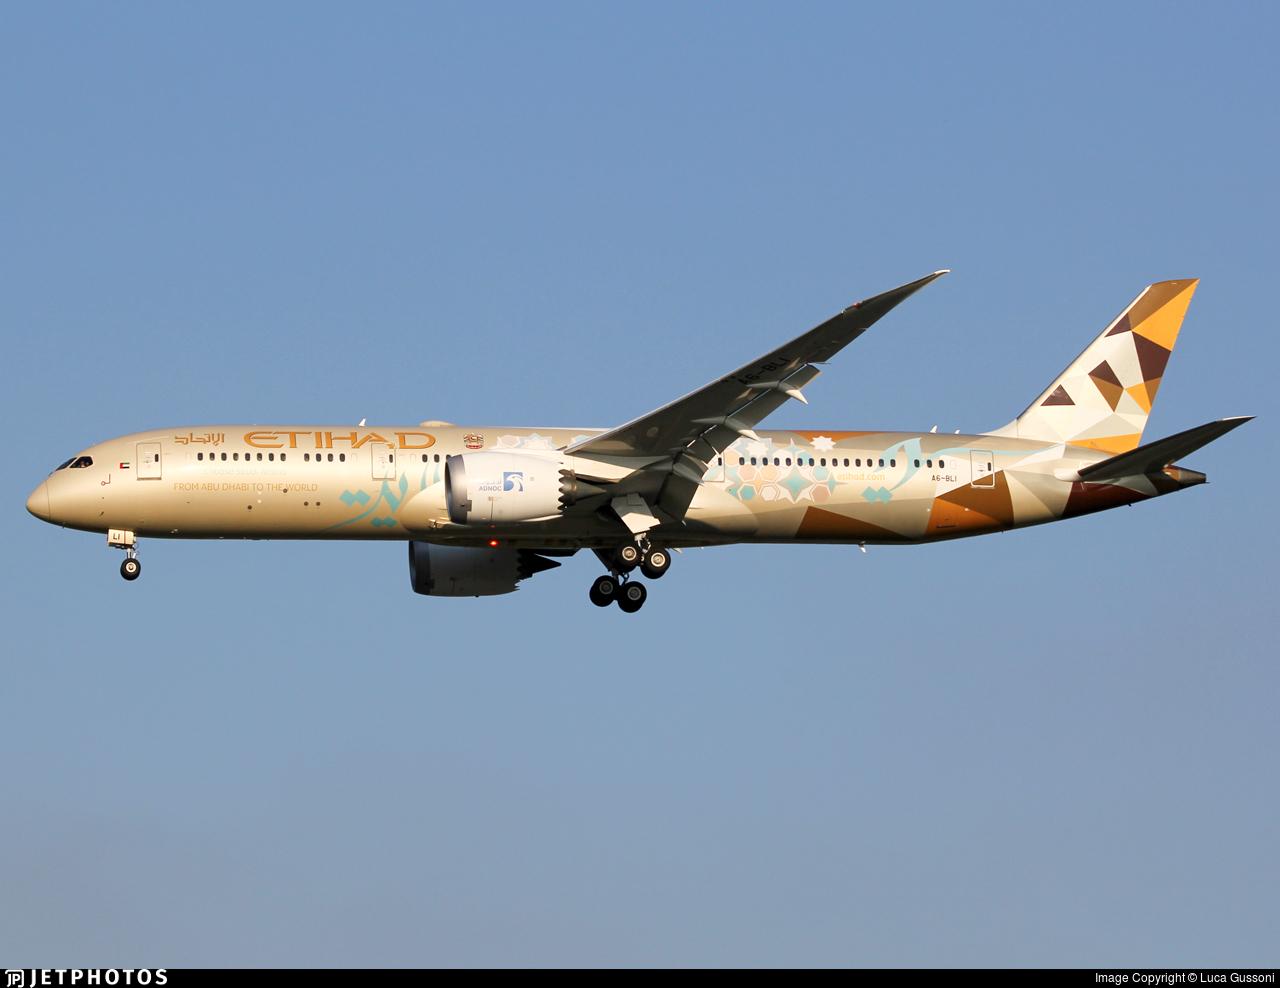 A6-BLI - Boeing 787-9 Dreamliner - Etihad Airways